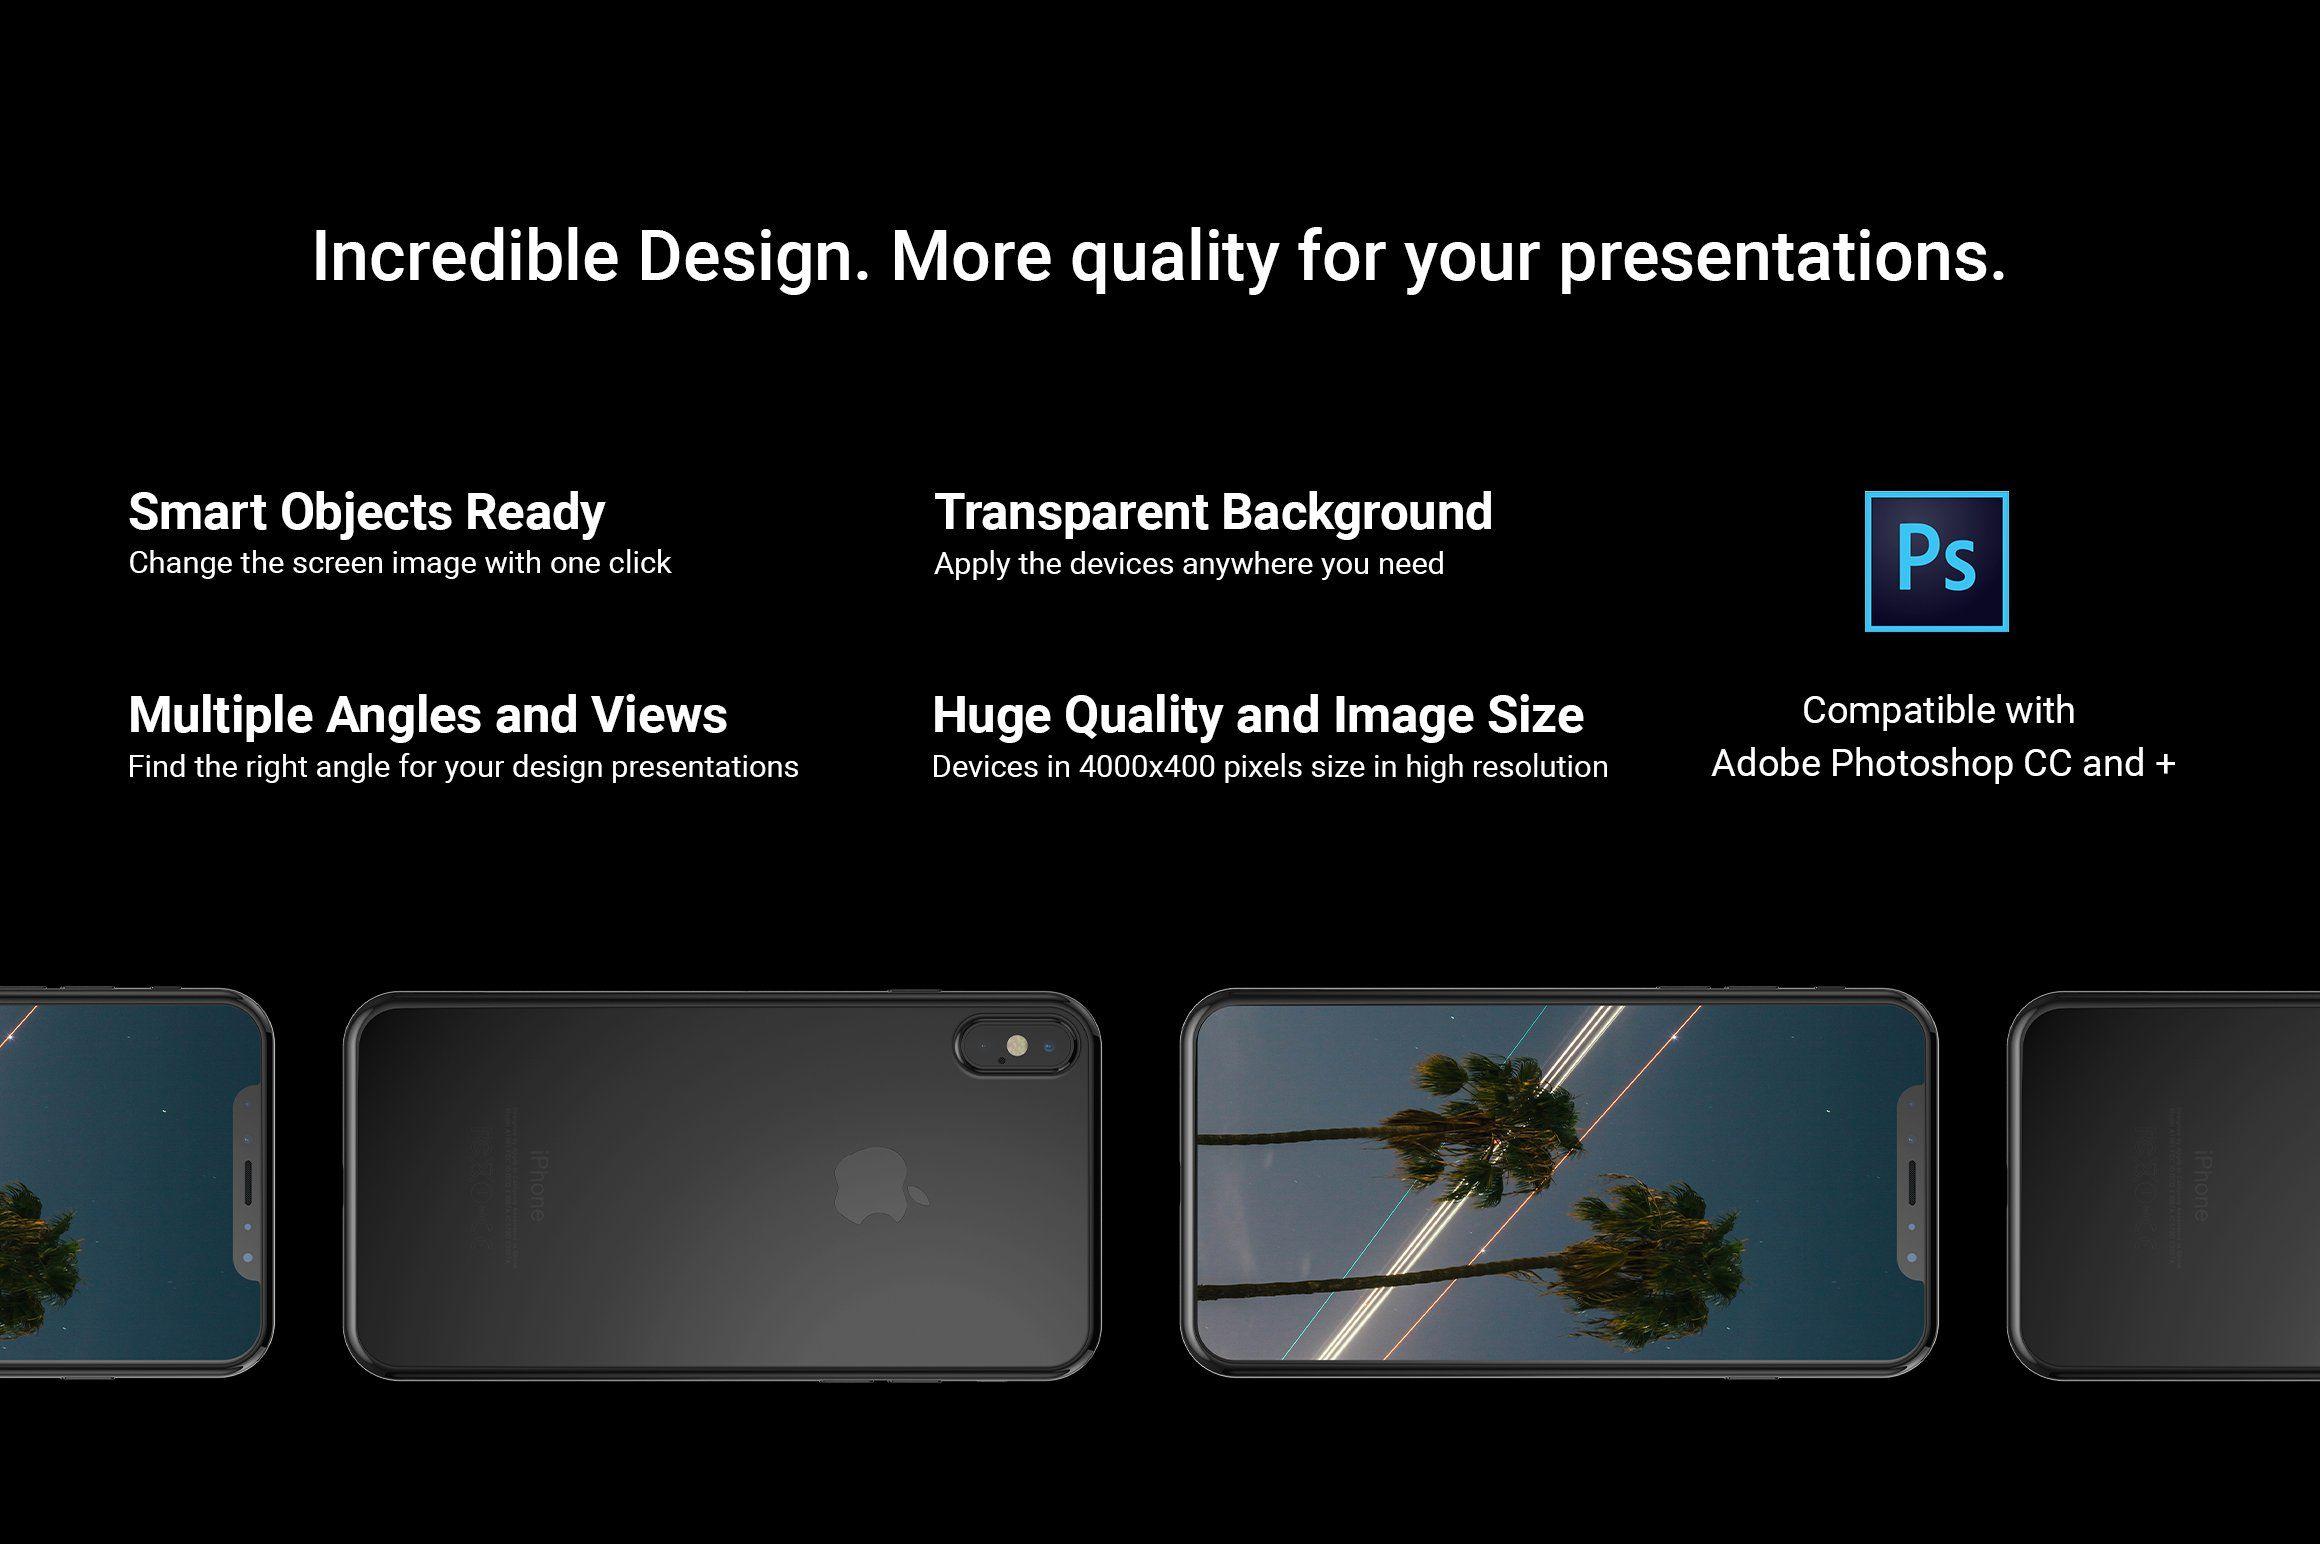 Iphone X Mockup Full Package Personal Presentation Iphone Mockup Mockup